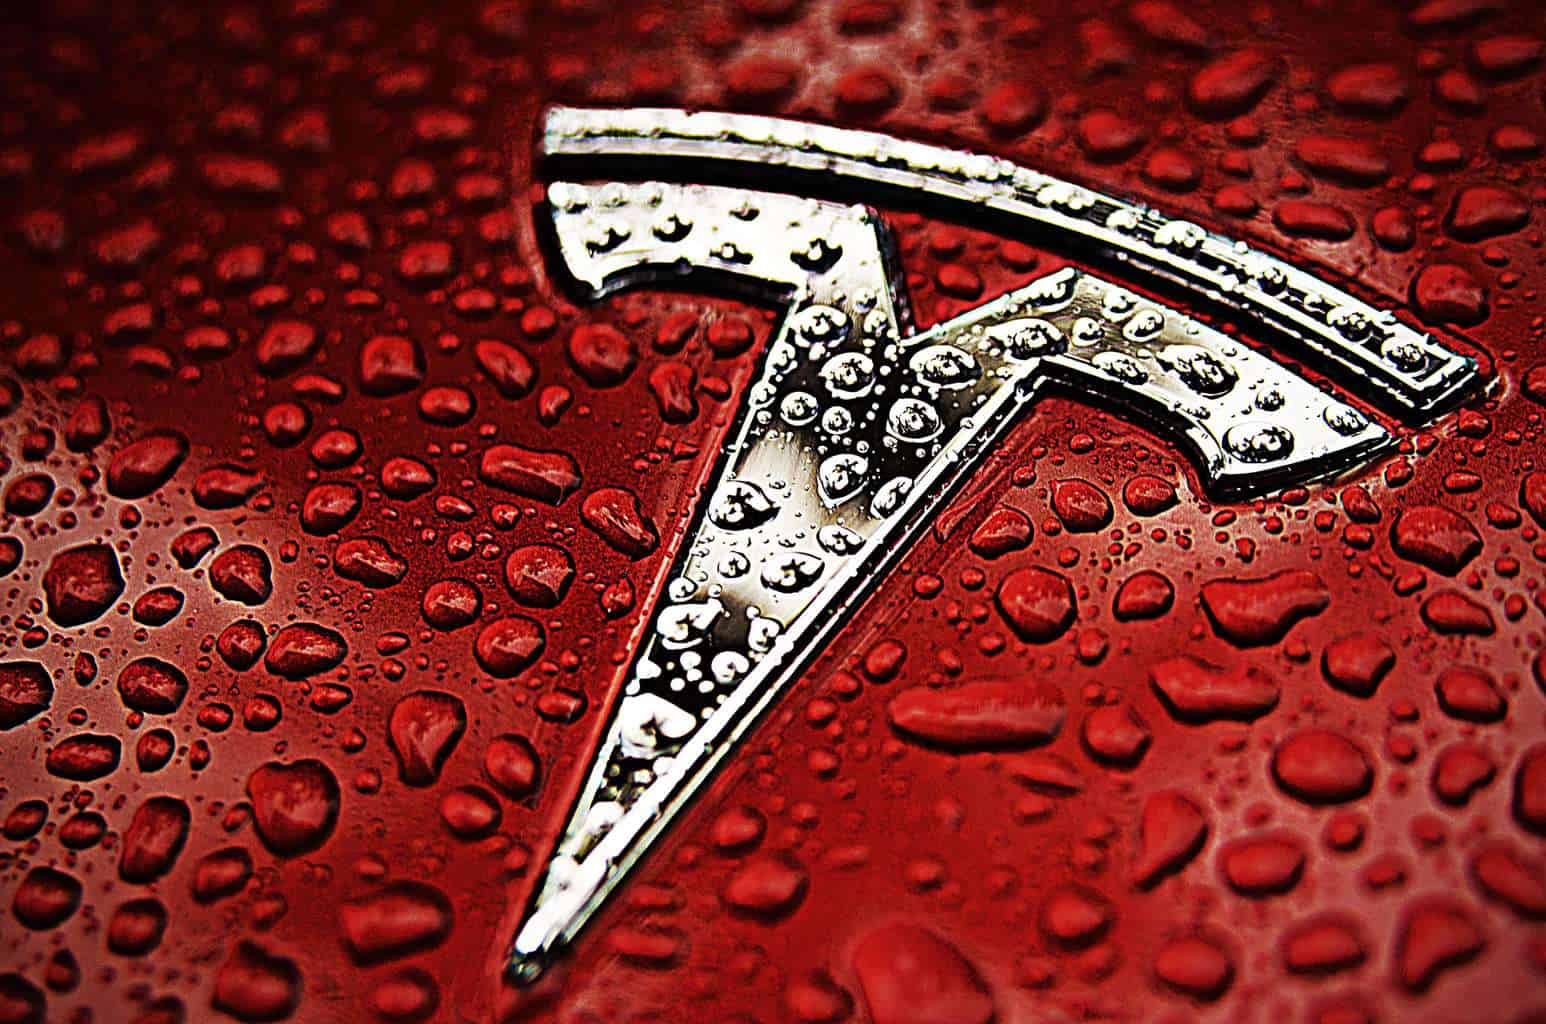 Tesla's Shanghai based Gigafactory 3 Reportedly Ahead of Schedule